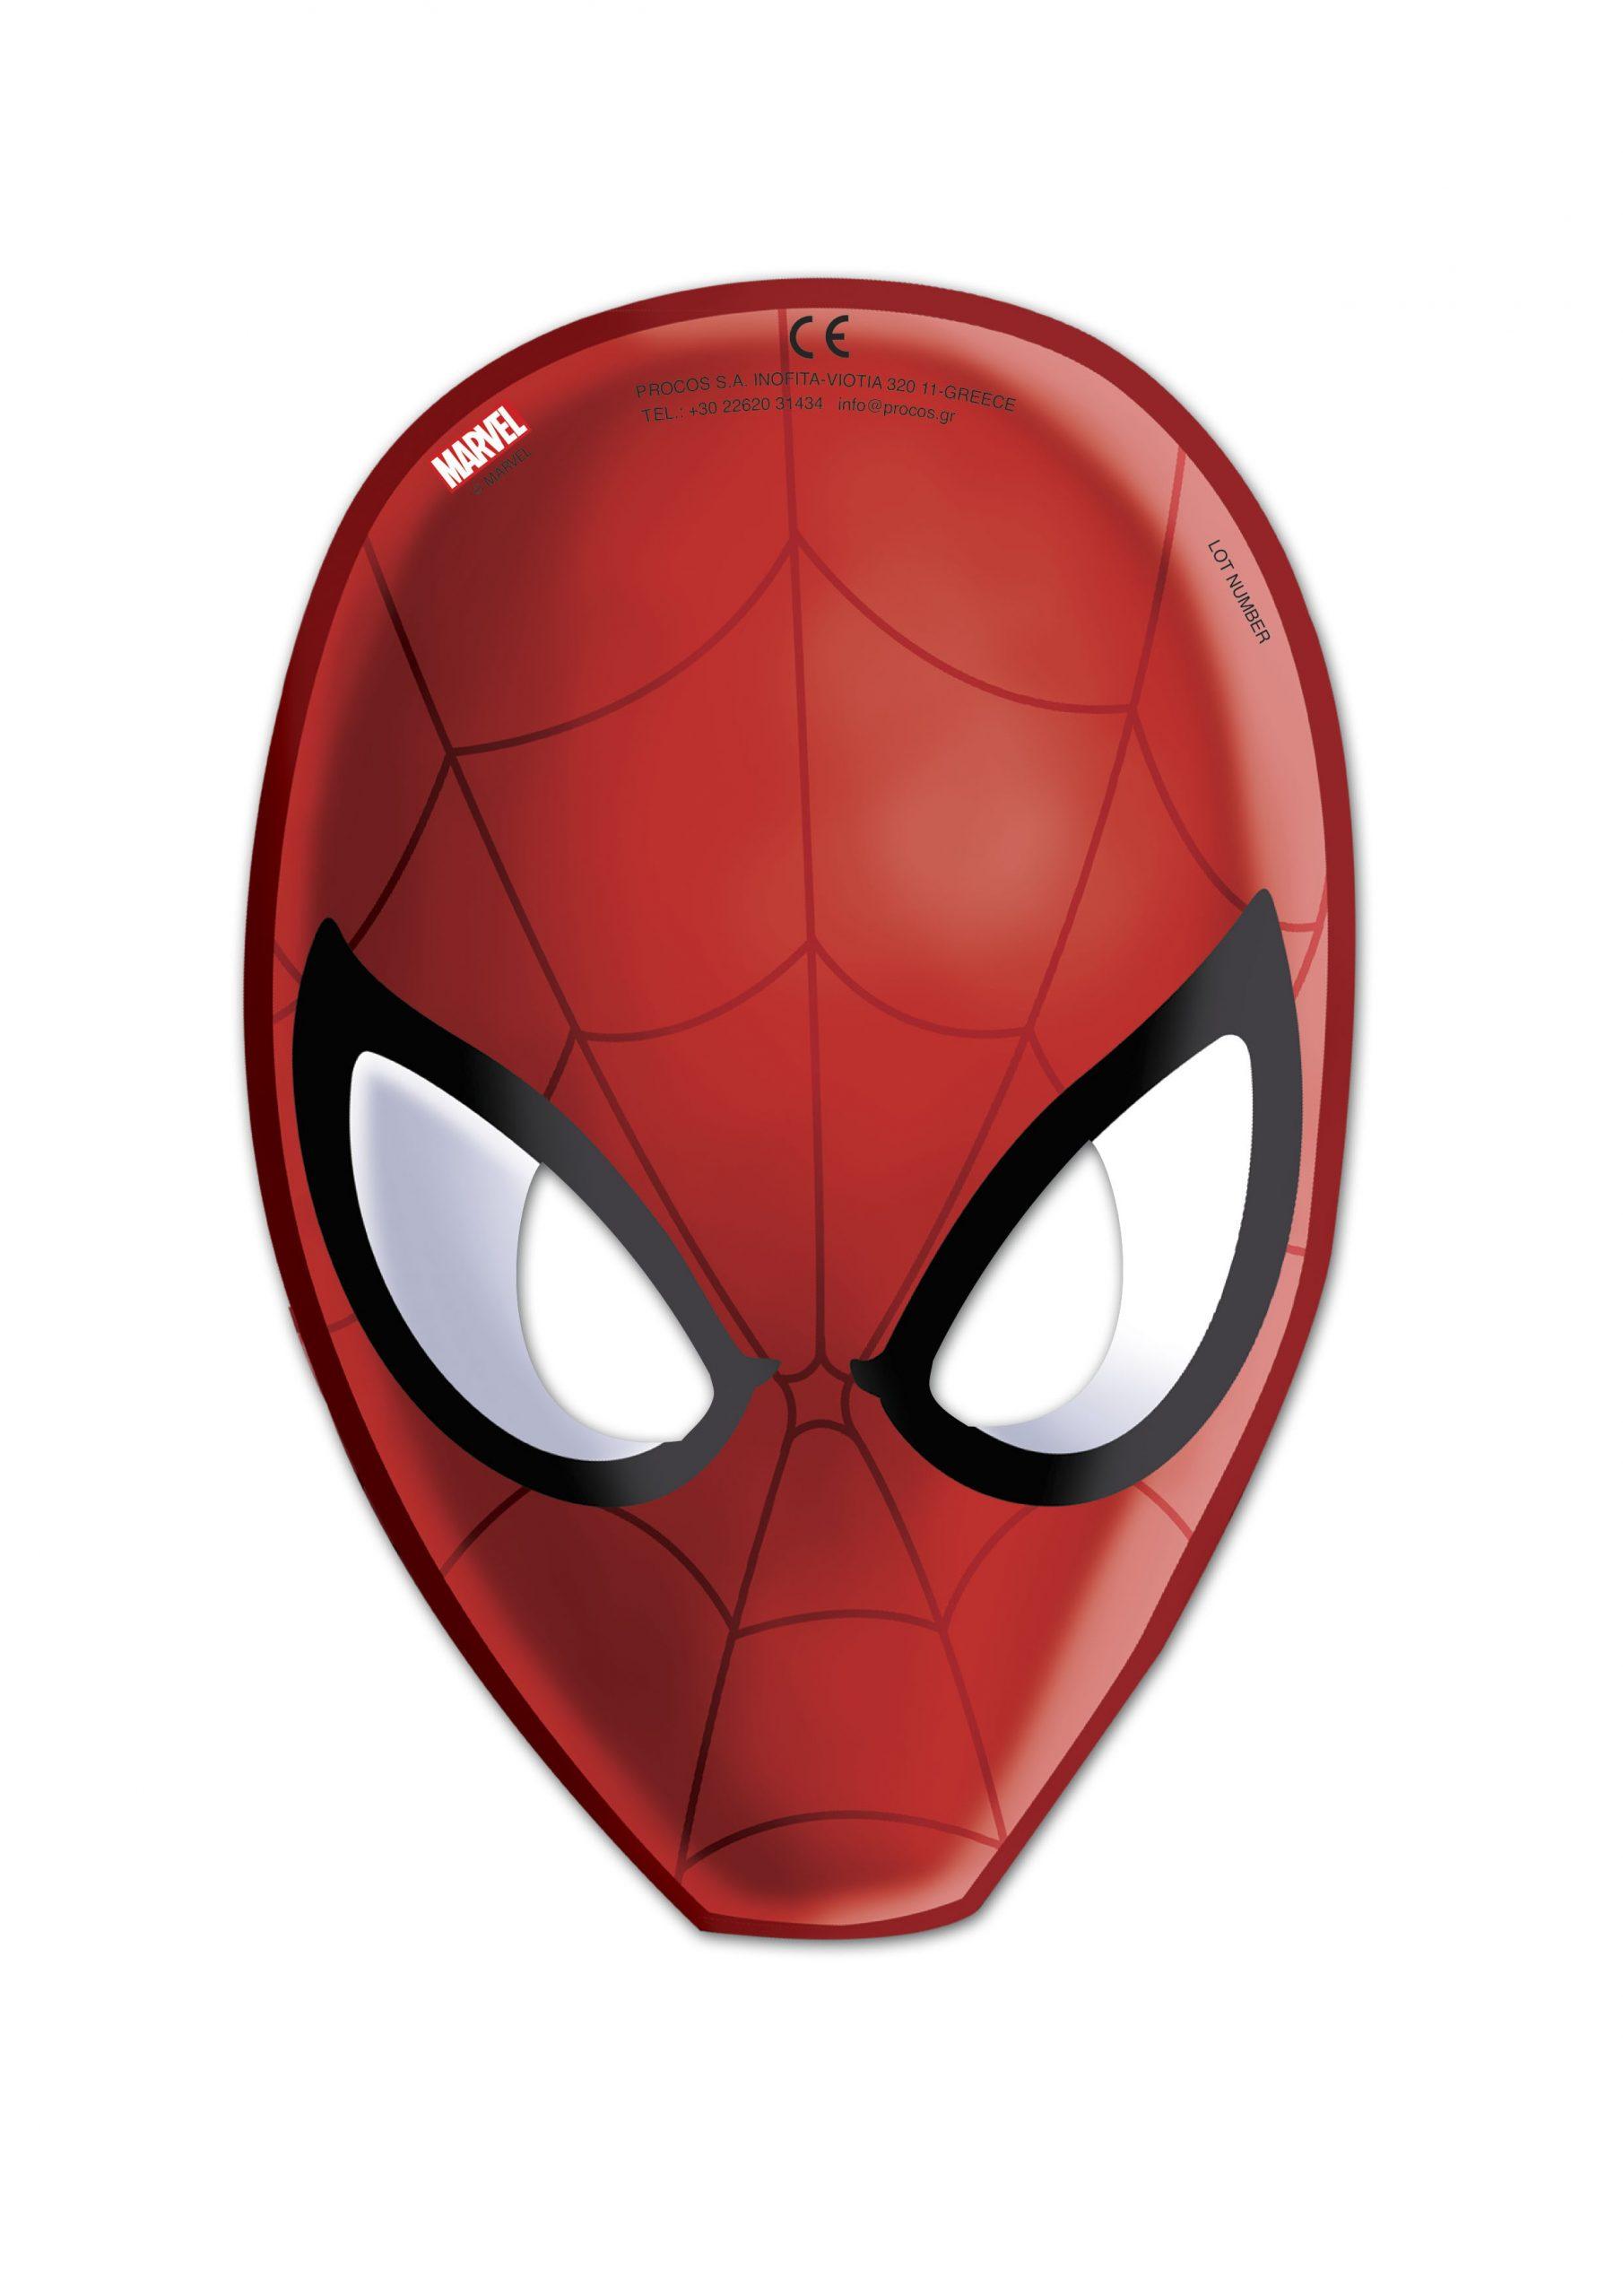 Masque Spiderman avec Masque Spiderman A Imprimer